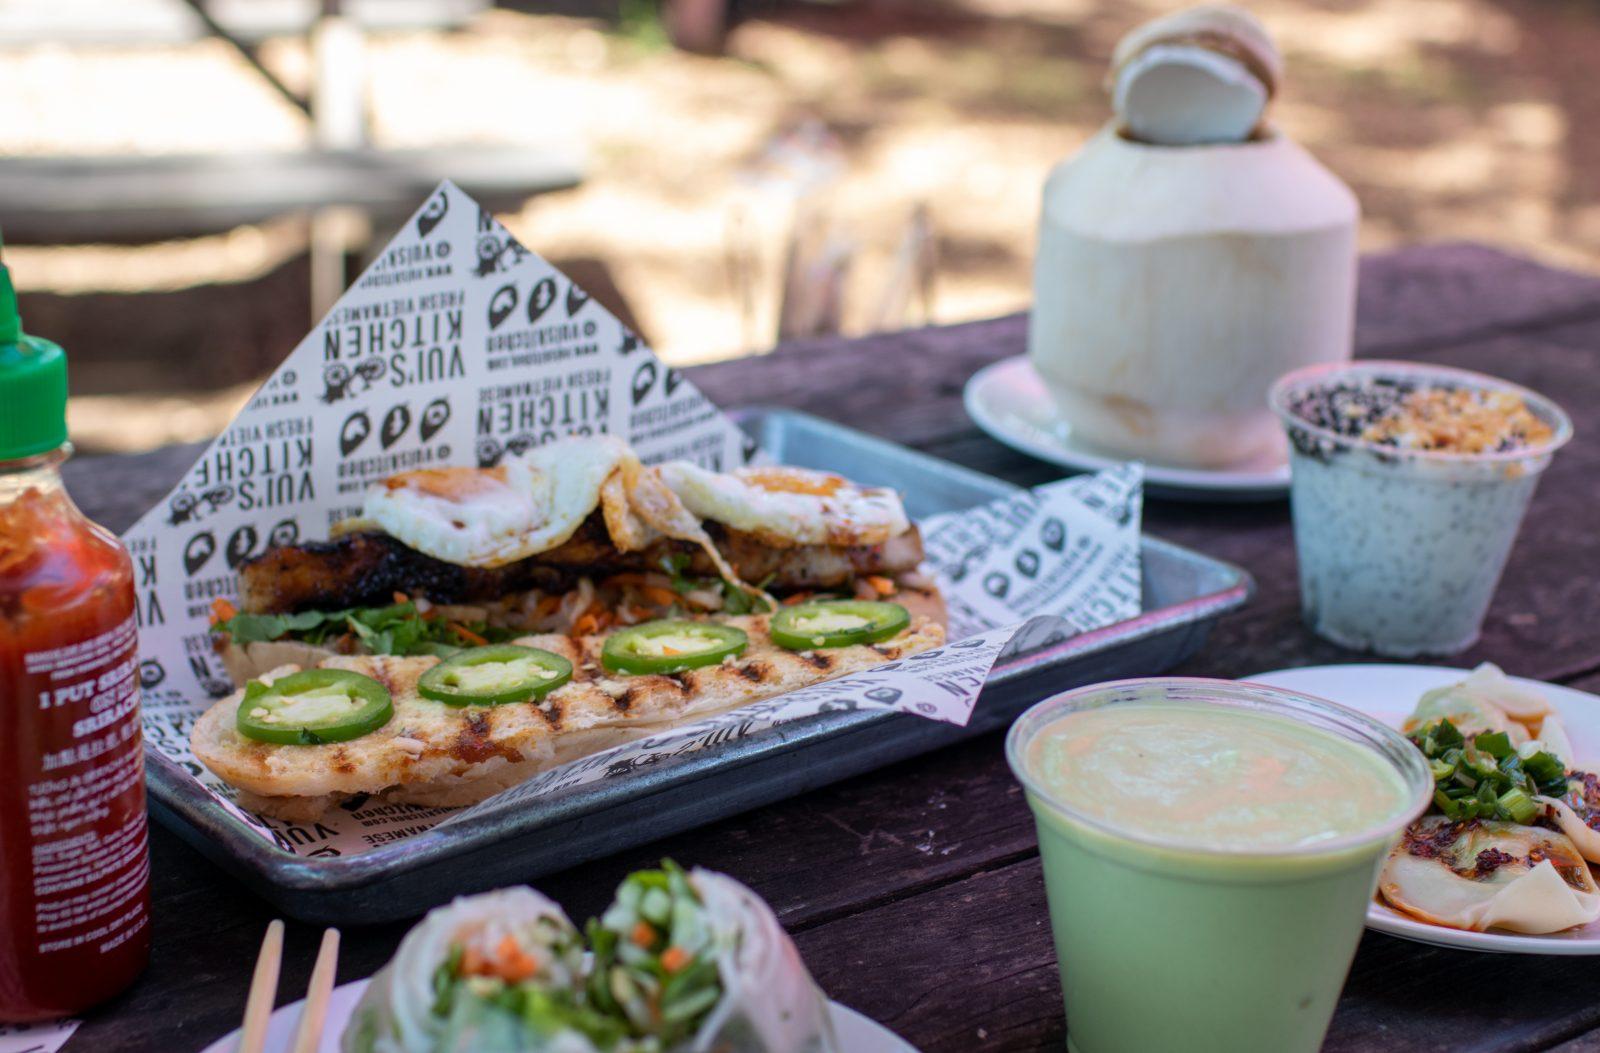 vui's kitchen Vietnamese food berry hill outdoor patio lunch bahn mi